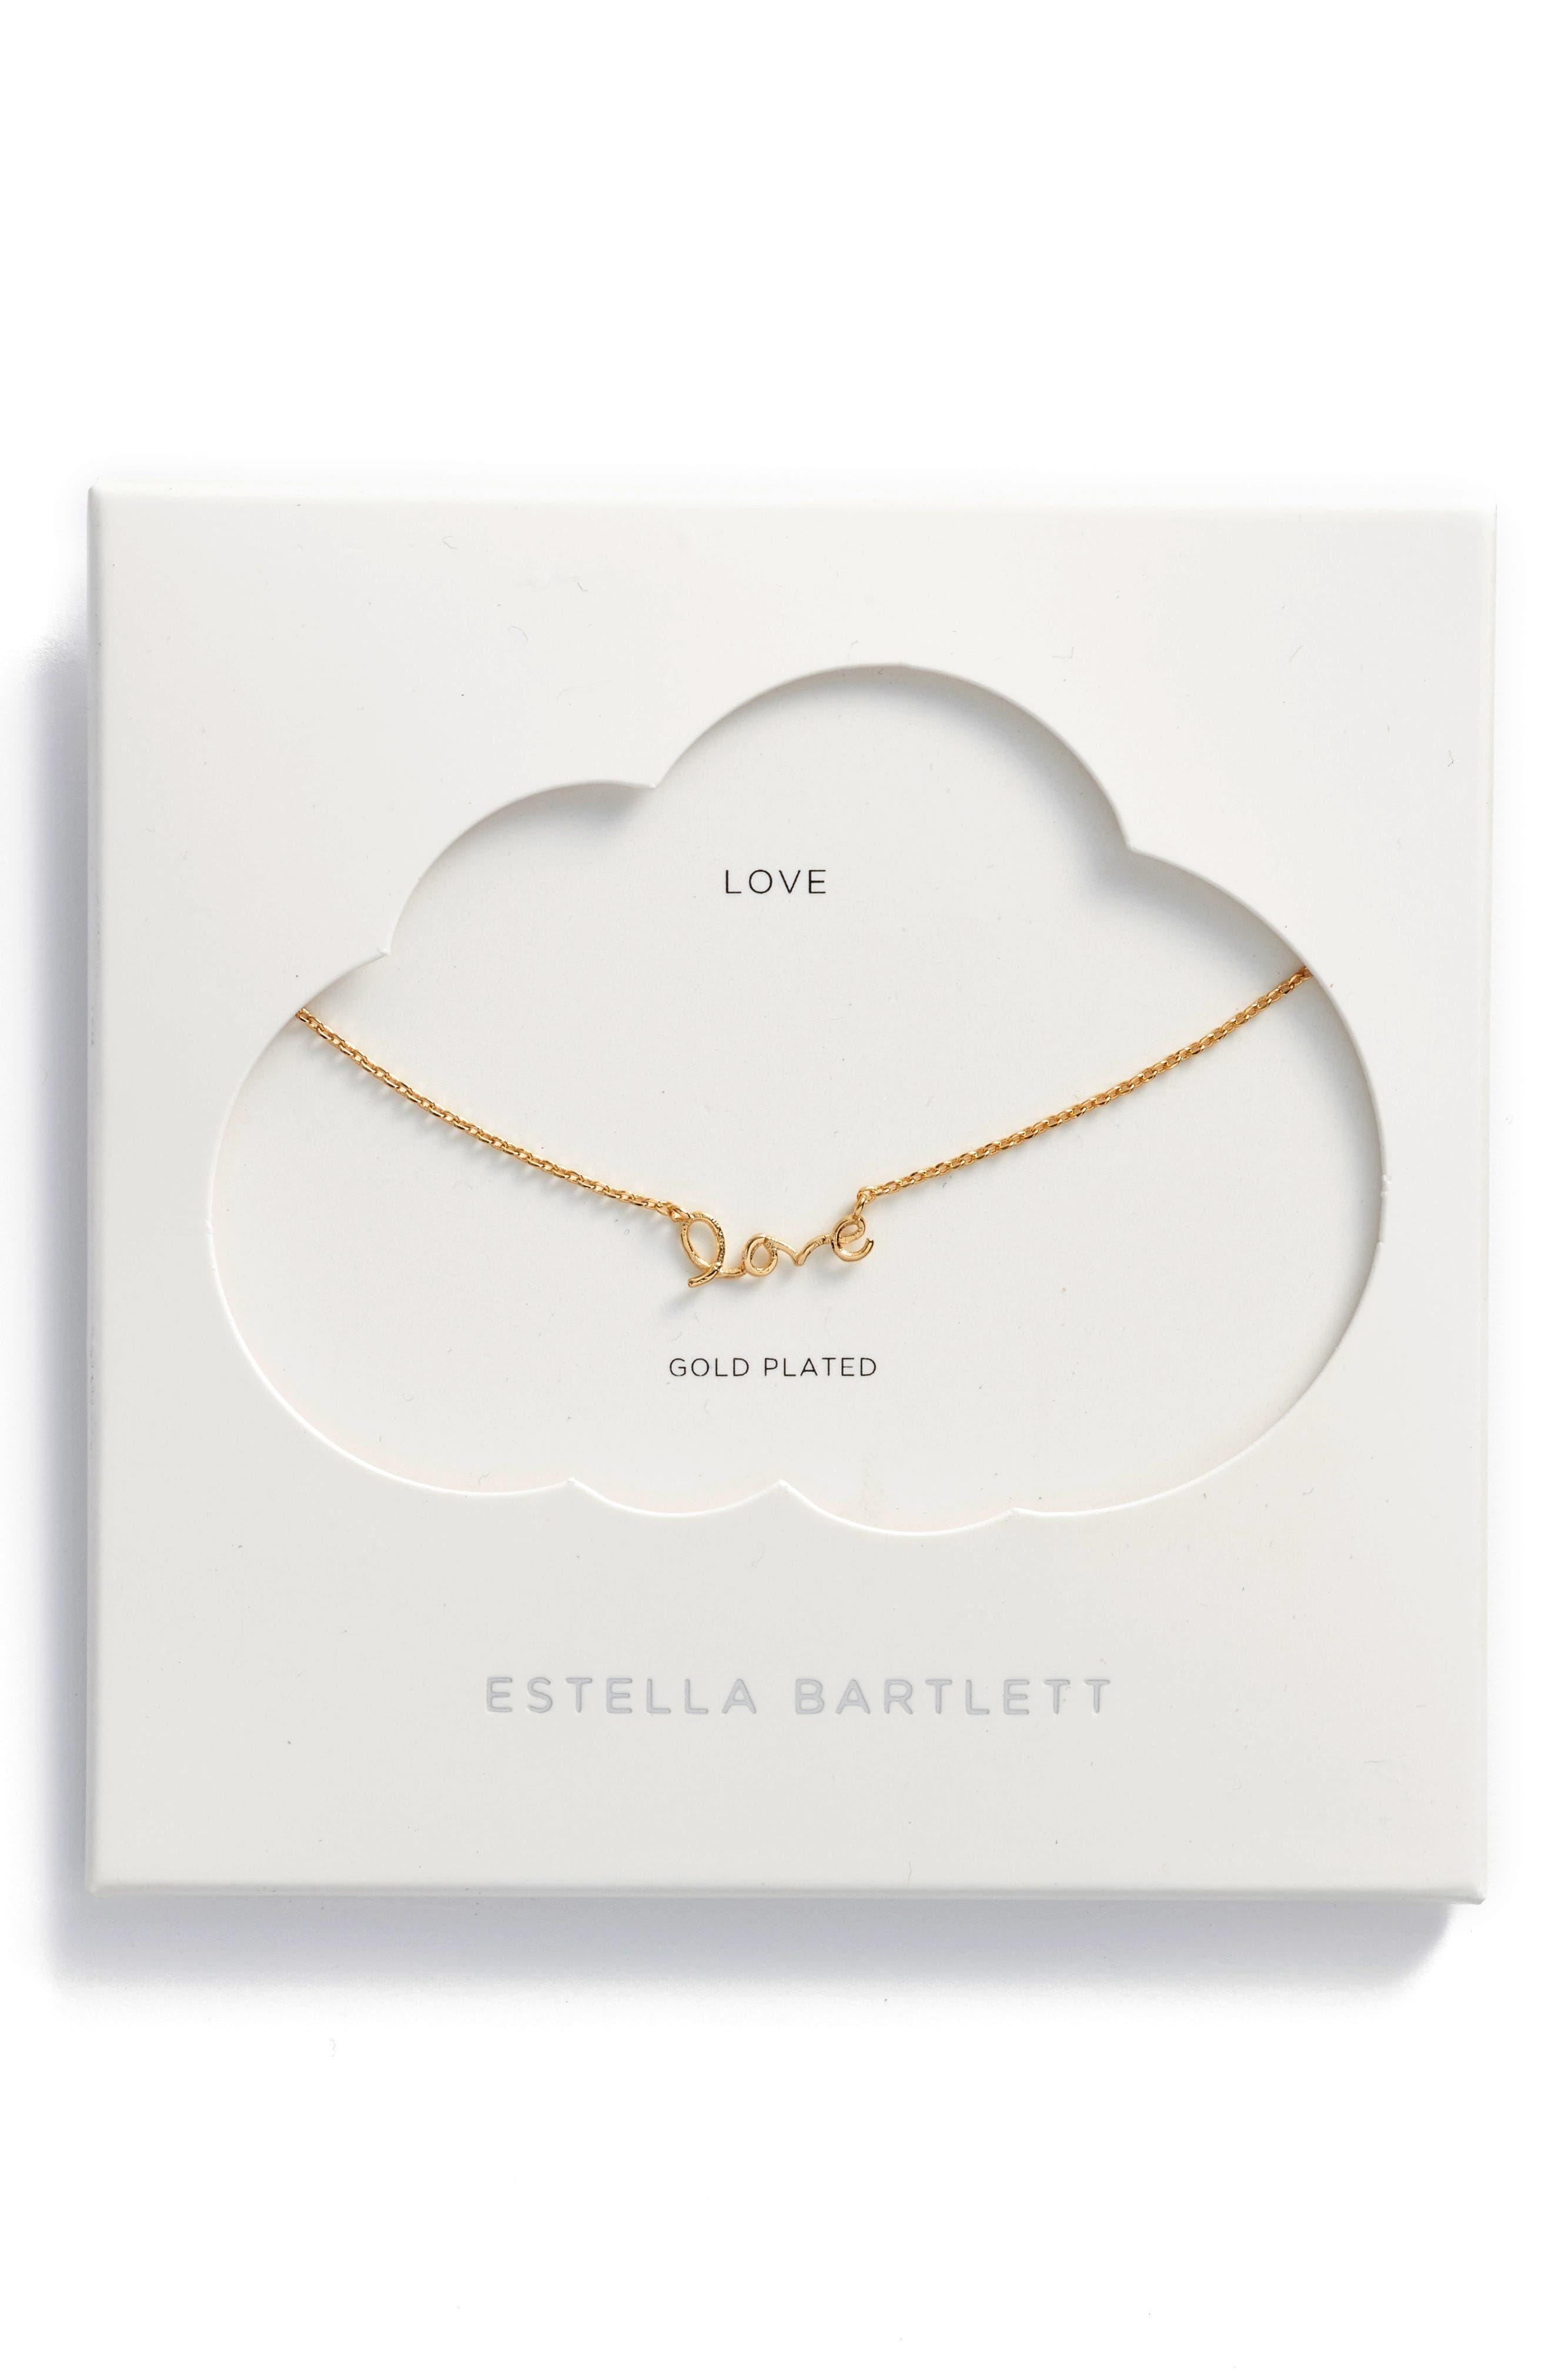 Alternate Image 1 Selected - Estella Bartlett Love Pendant Necklace